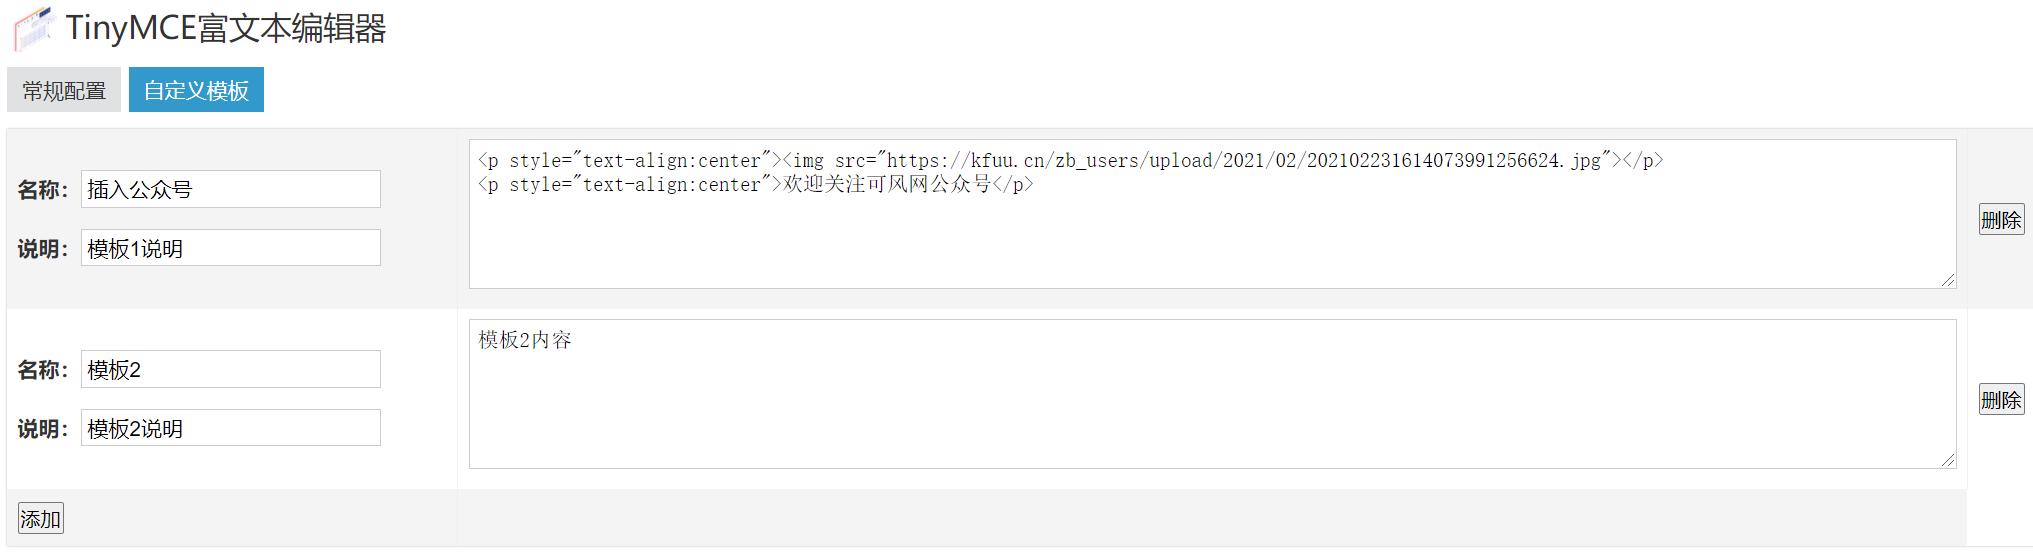 Zblog TinyMCE 富文本编辑器,分享,zblog教程,Zblog,主题模板,插件,Zblog插件,第3张